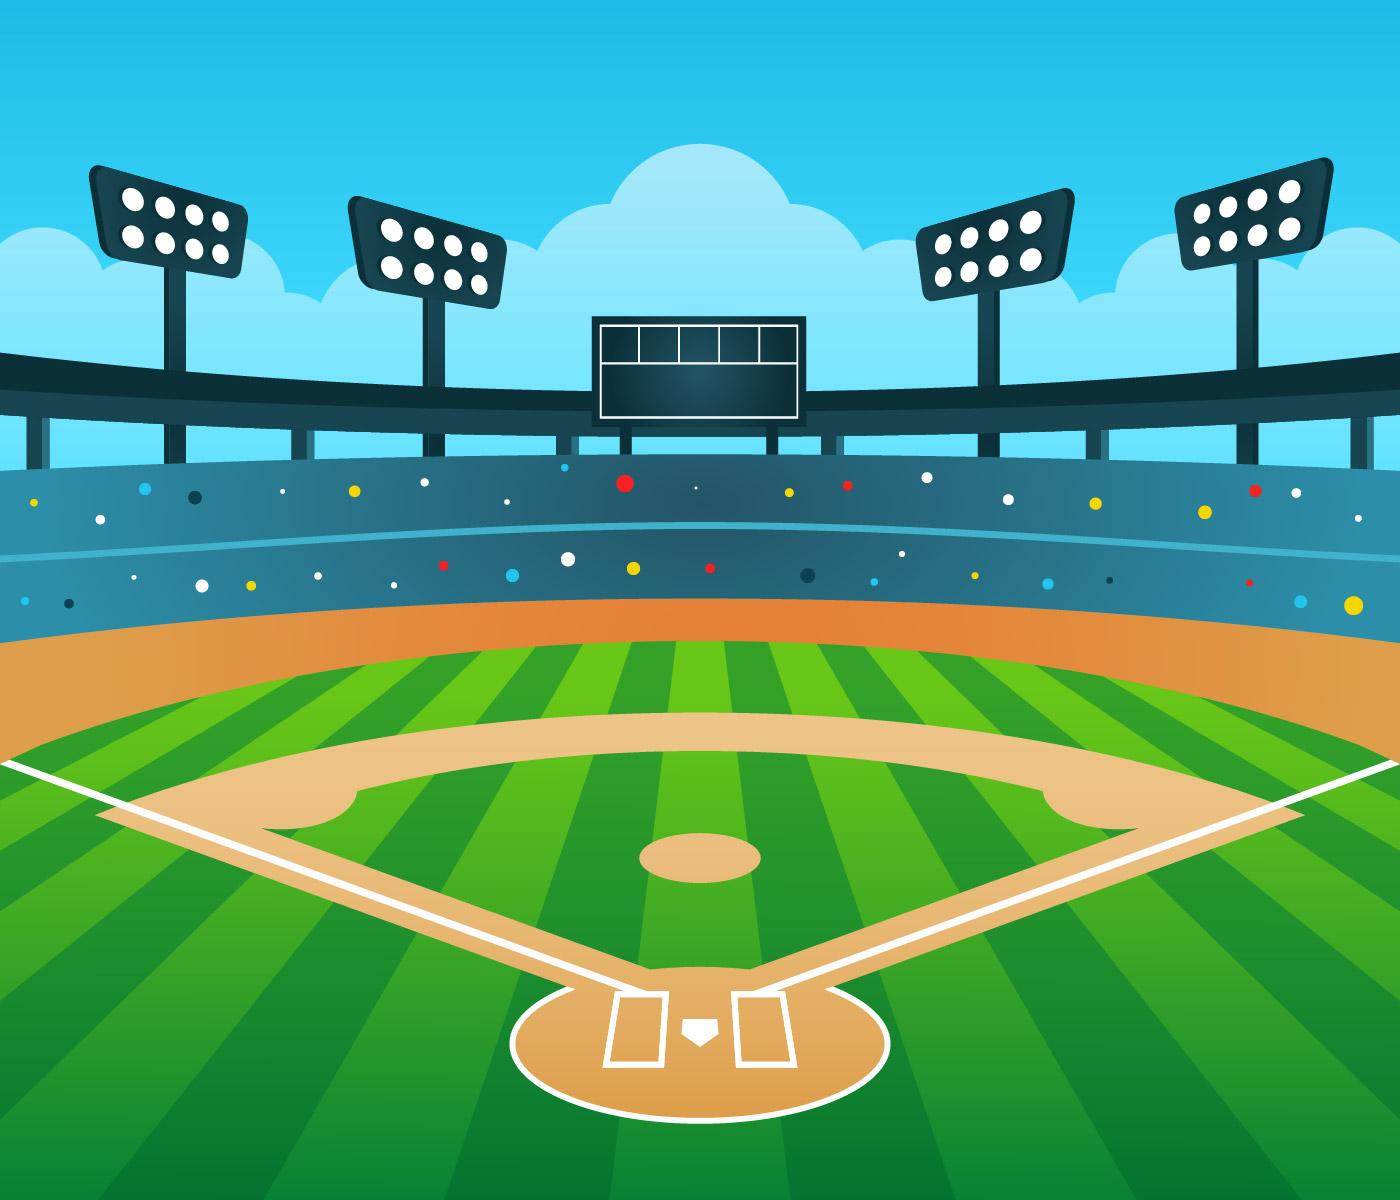 Stadium Lights Free Vector Art 9305 Free Downloads